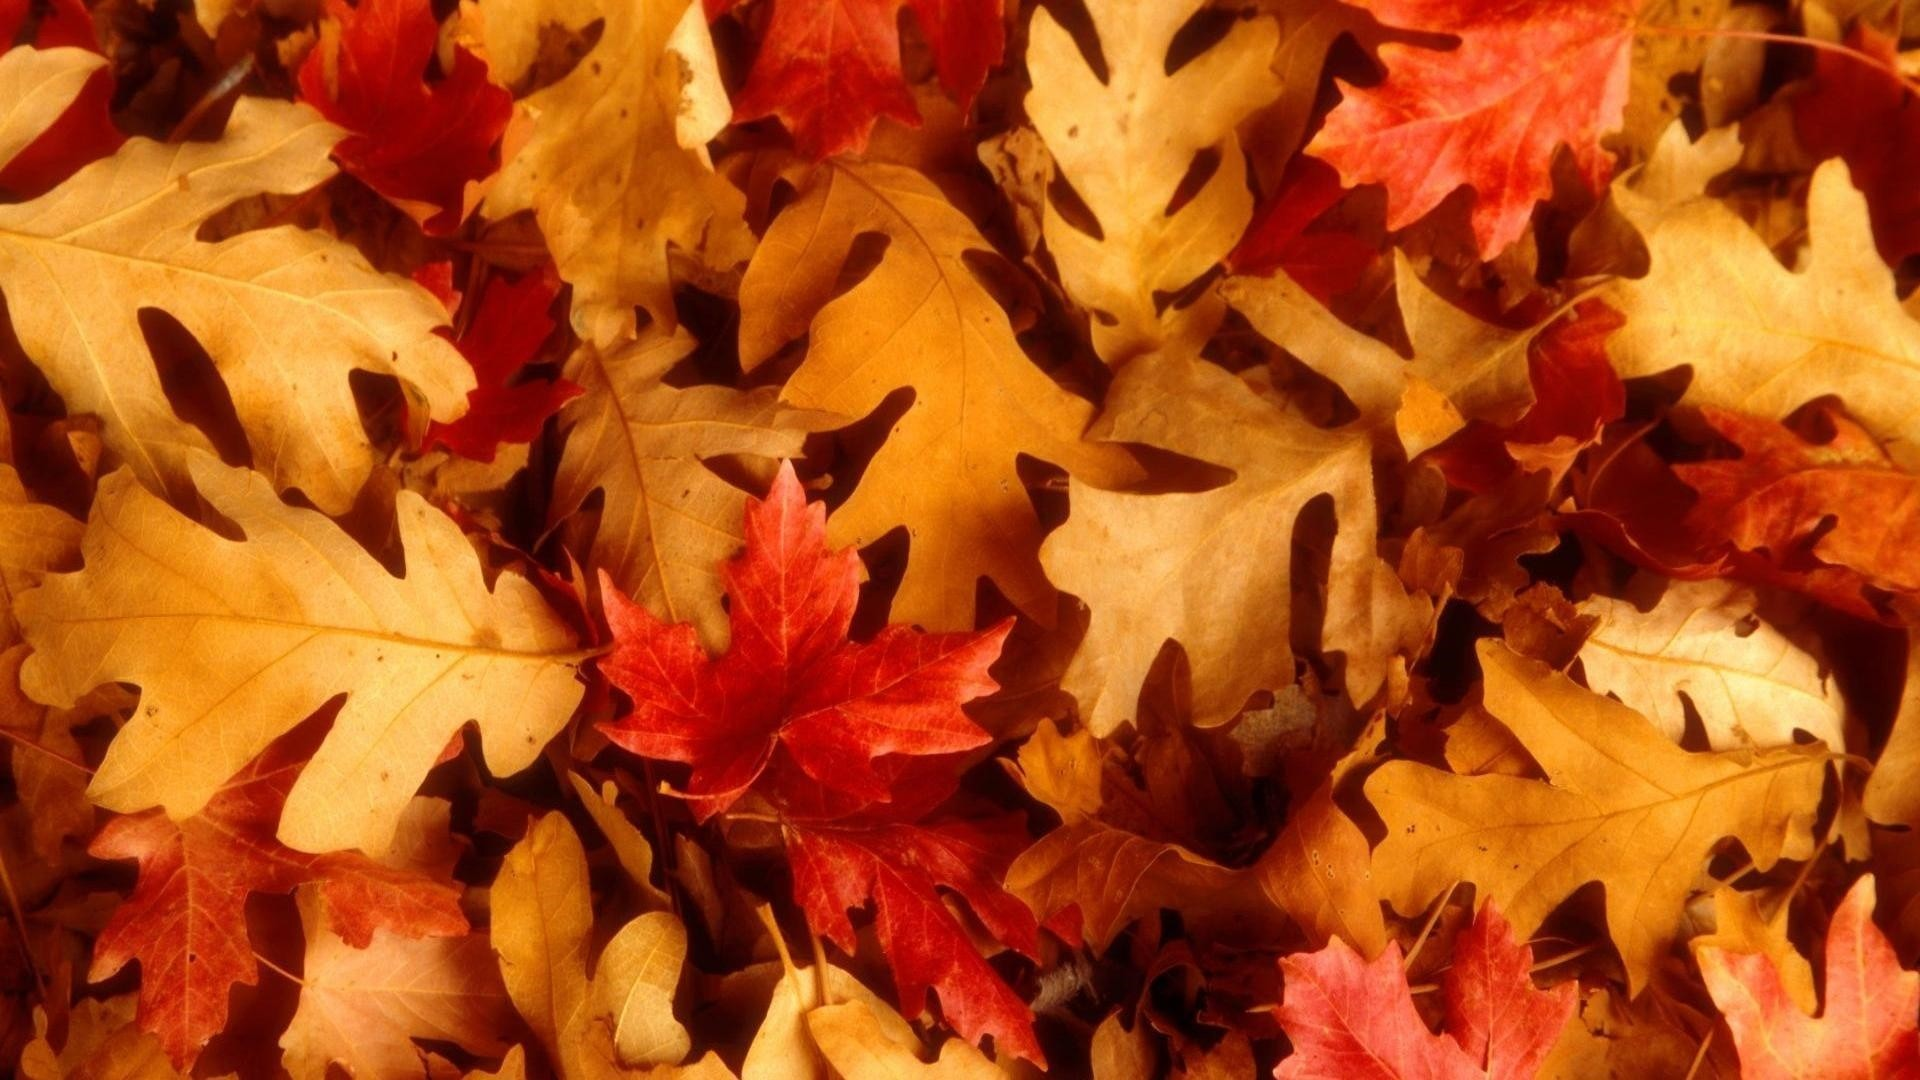 Fall Leaves Wallpaper image hd